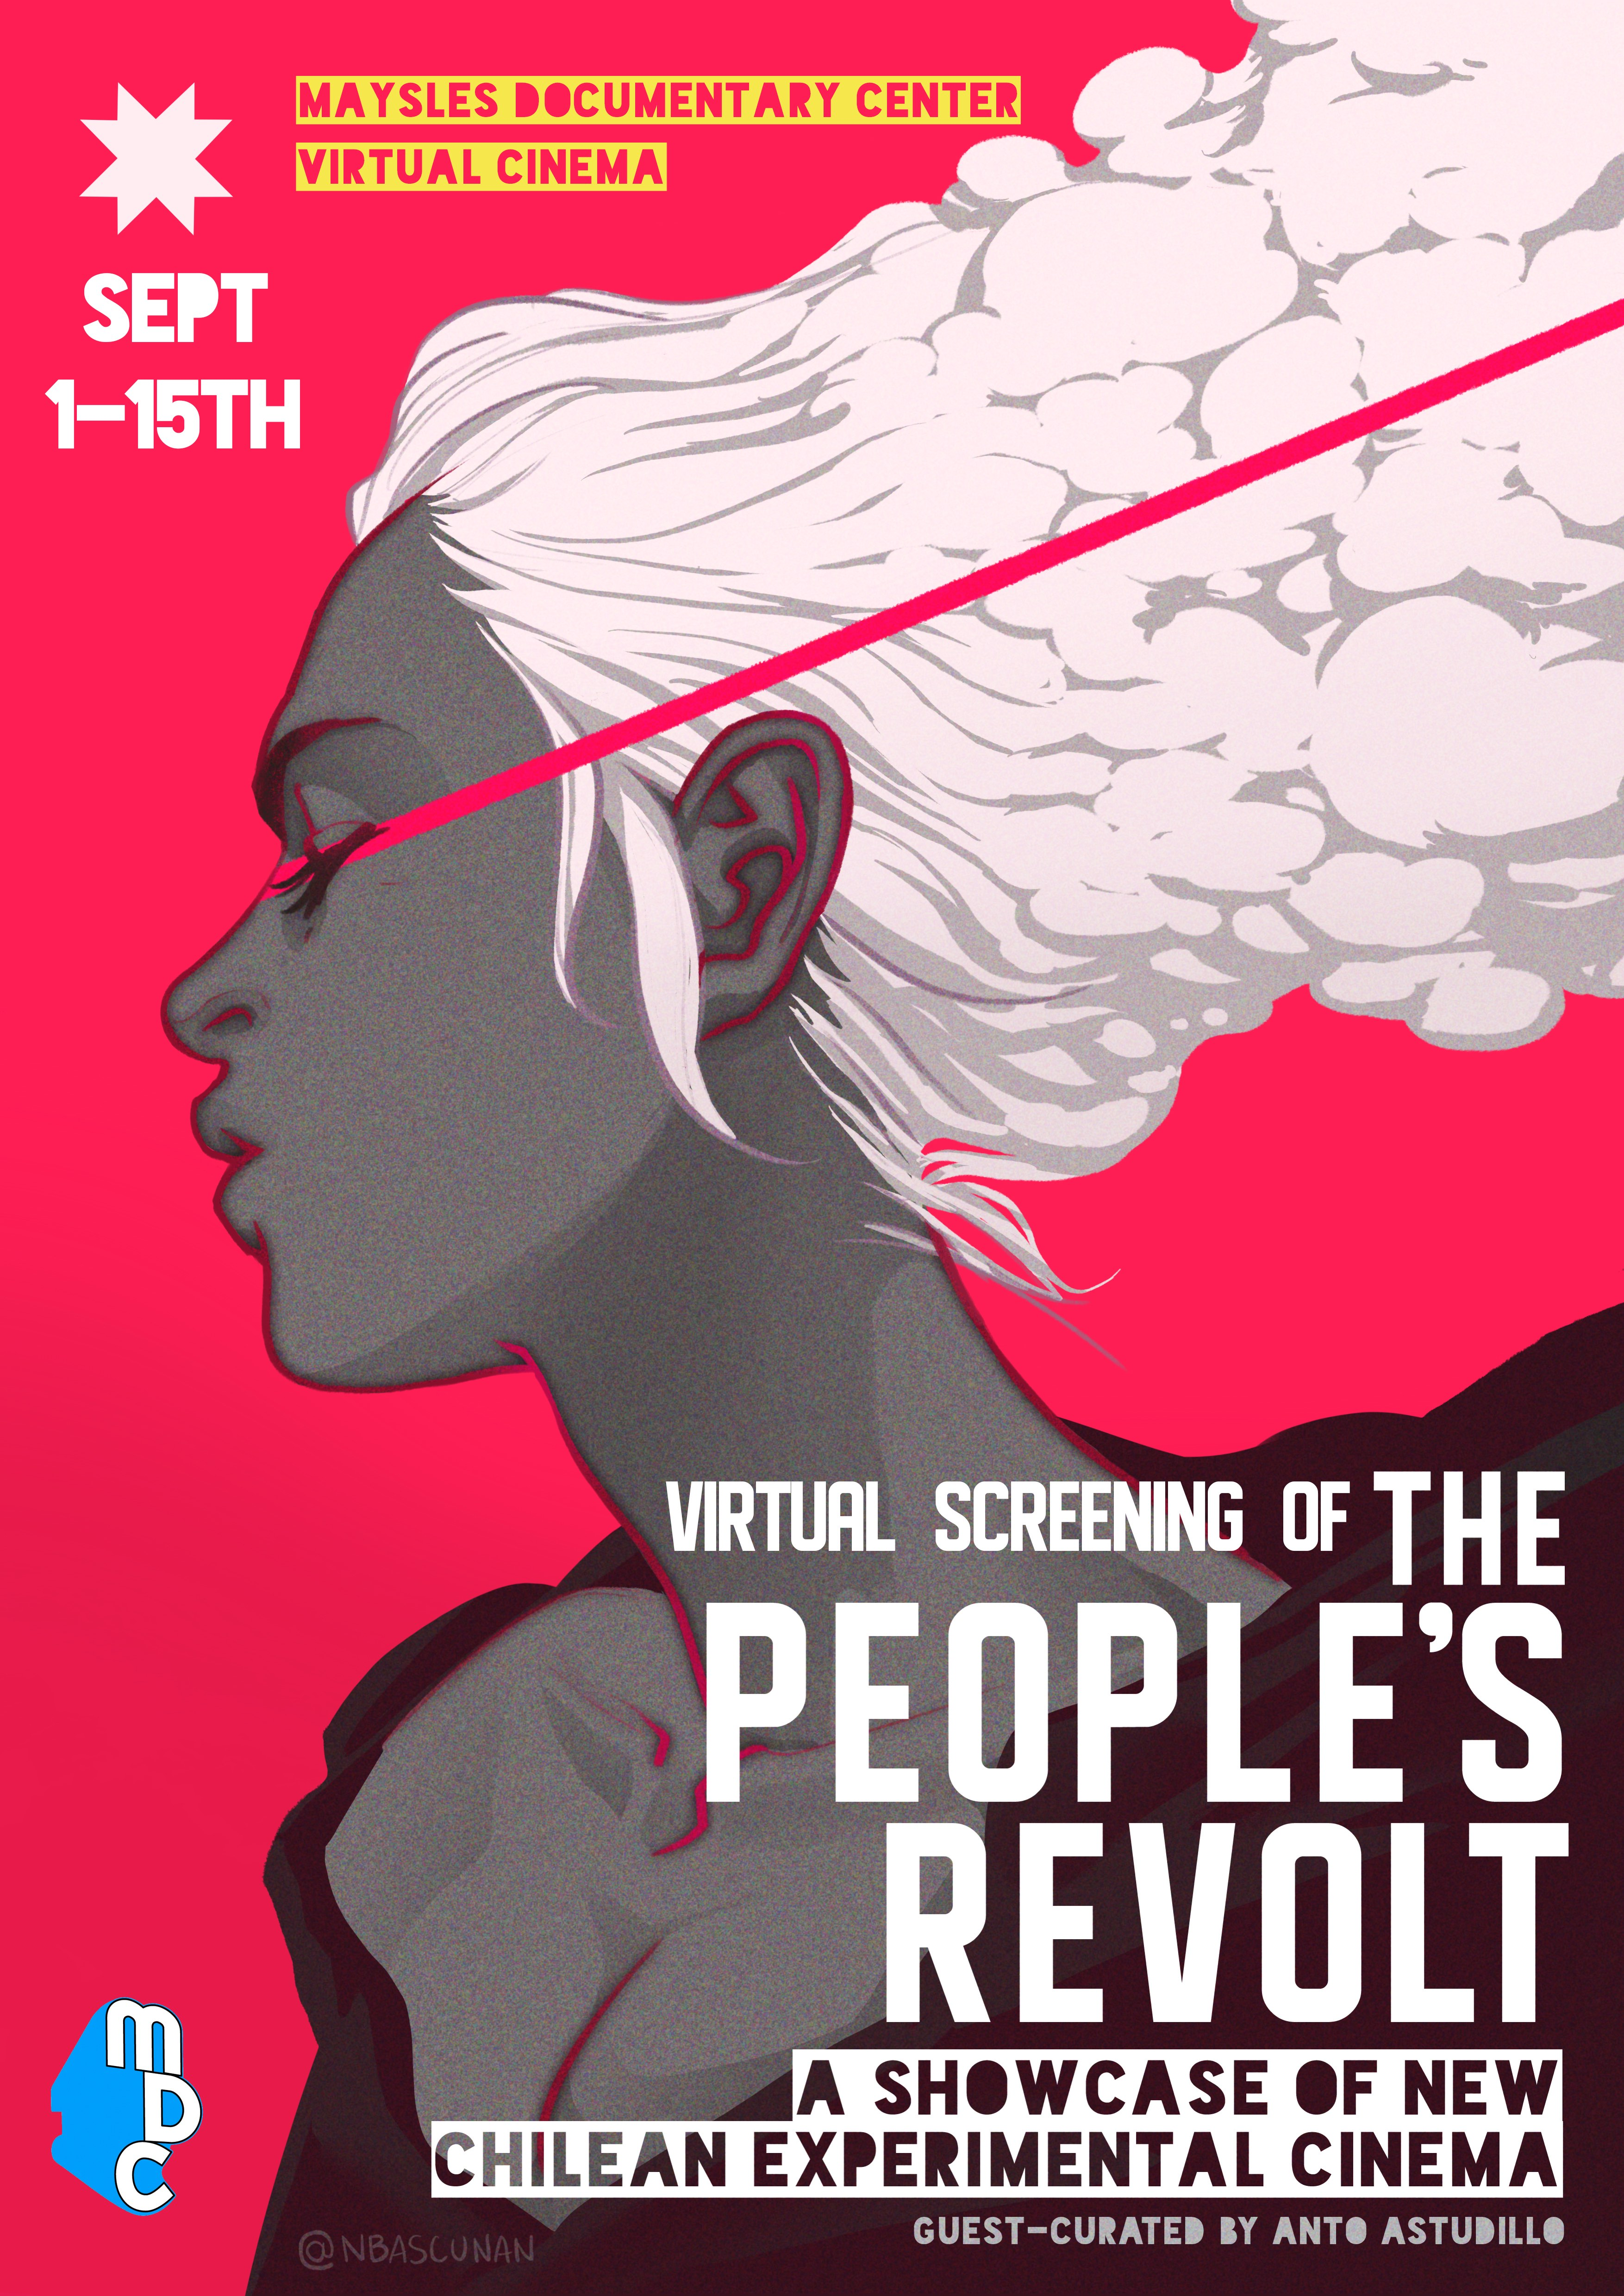 The_People's_Revolt-en-Maysles Vertical